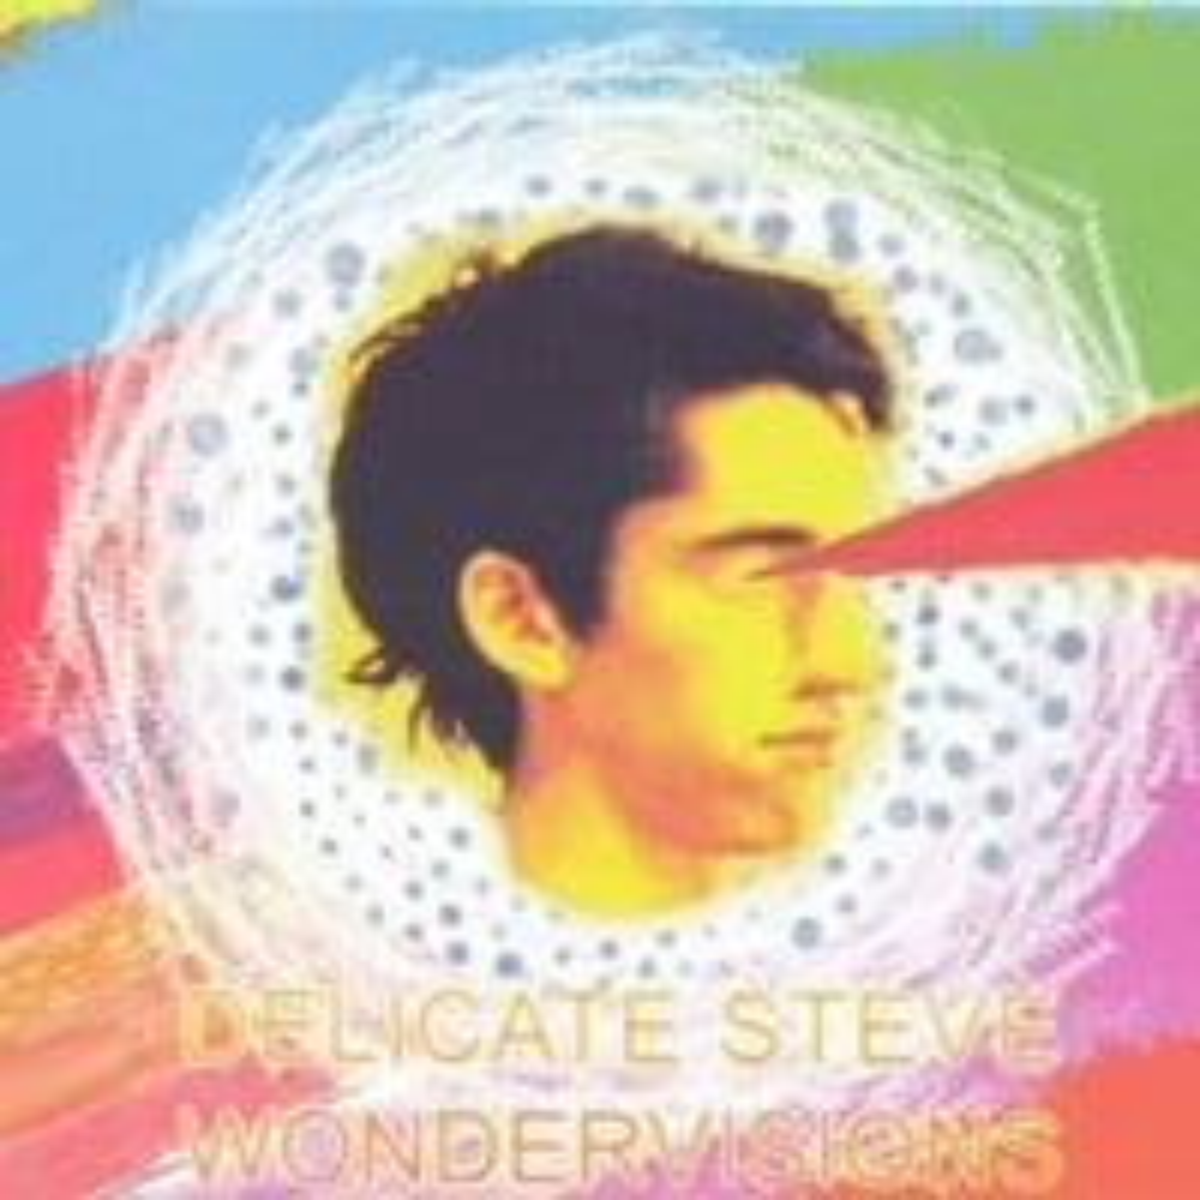 Delicate Steve, Wondervisions